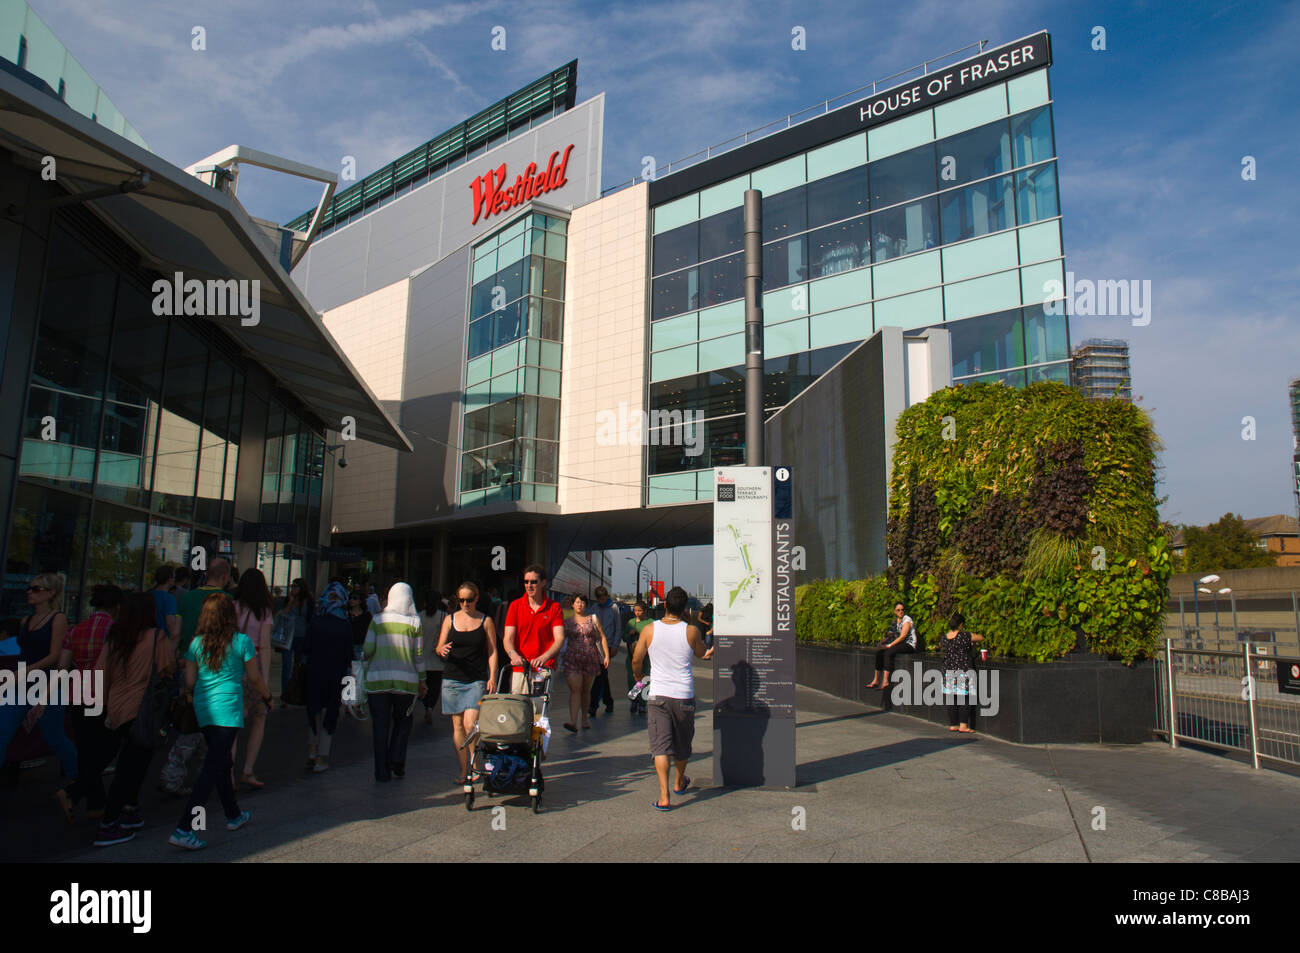 Westfield shopping centre Shepherd's Bush district west London England UK Europe - Stock Image